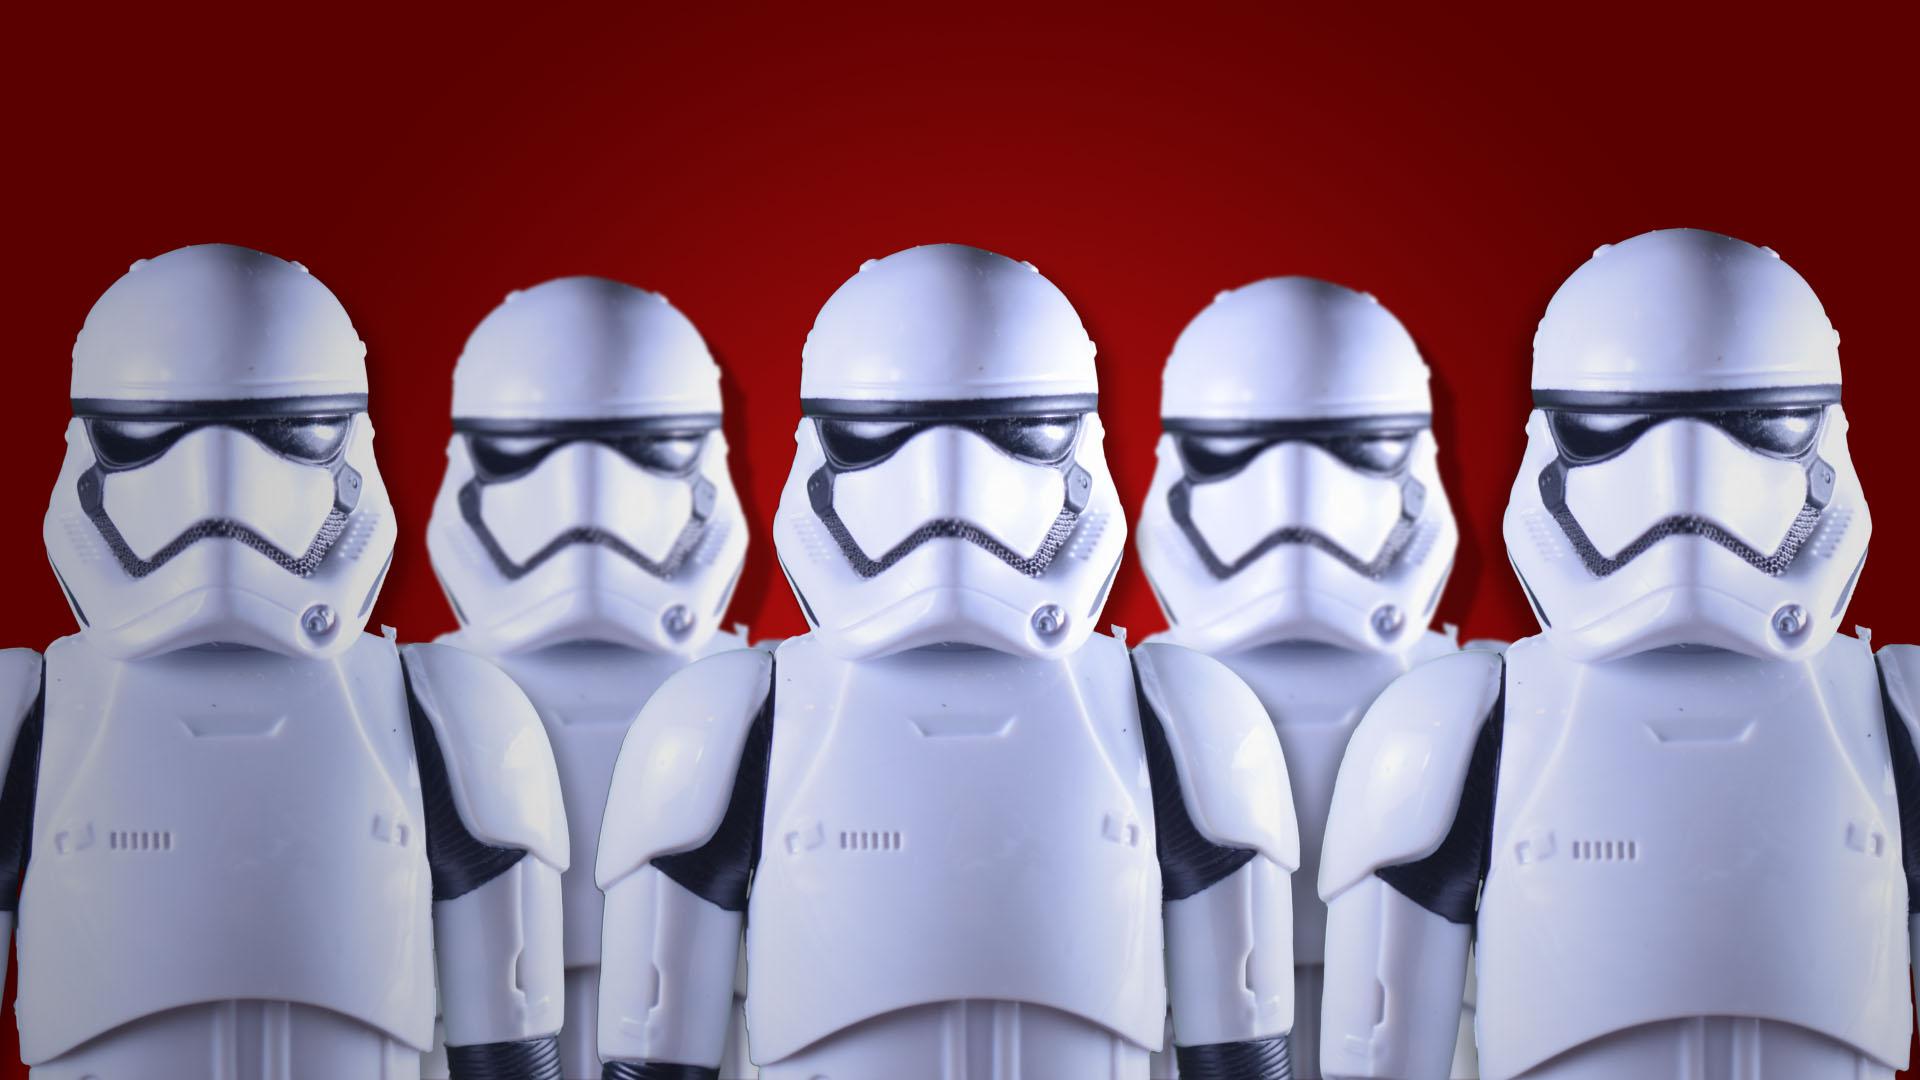 Bots, Trolls Propelled Faux 'Star Wars: The Last Jedi' Controversy